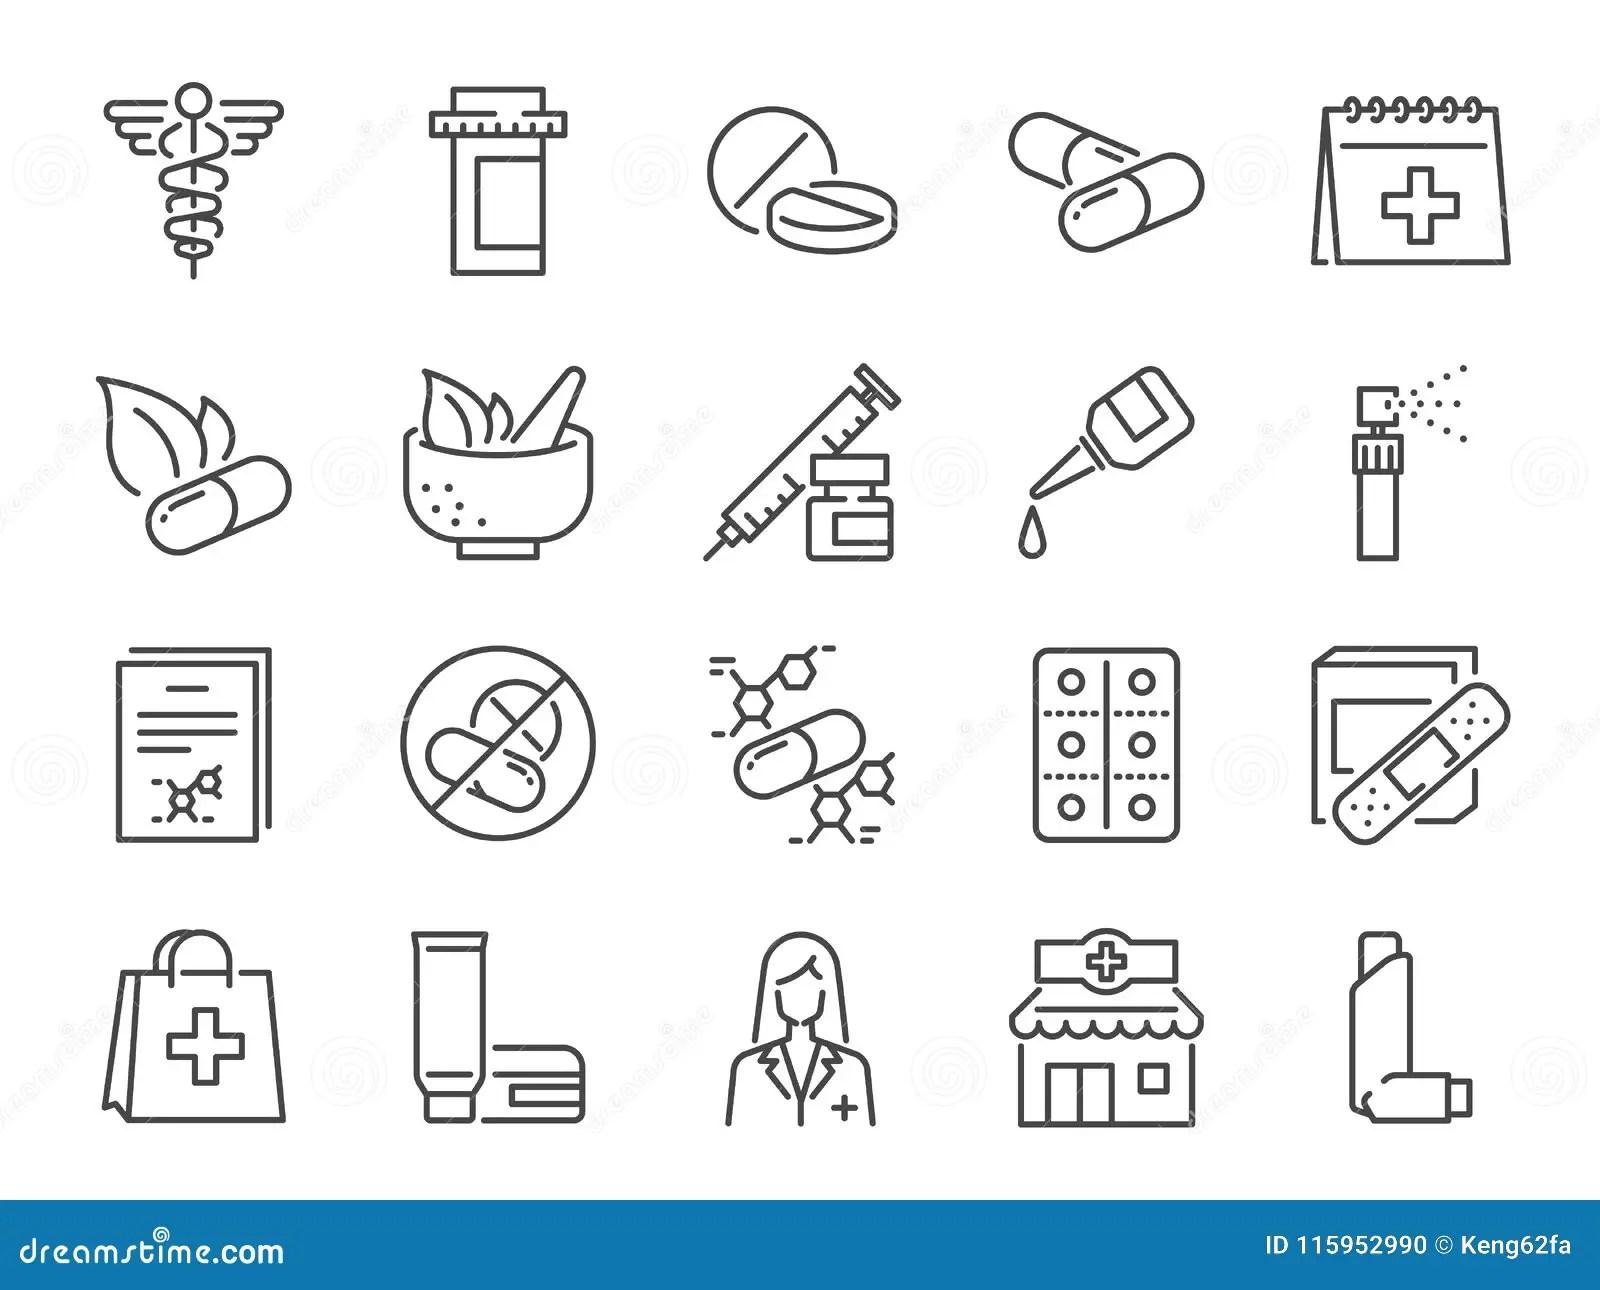 Medisch Stock Illustrations Vectors Amp Clipart 423 987